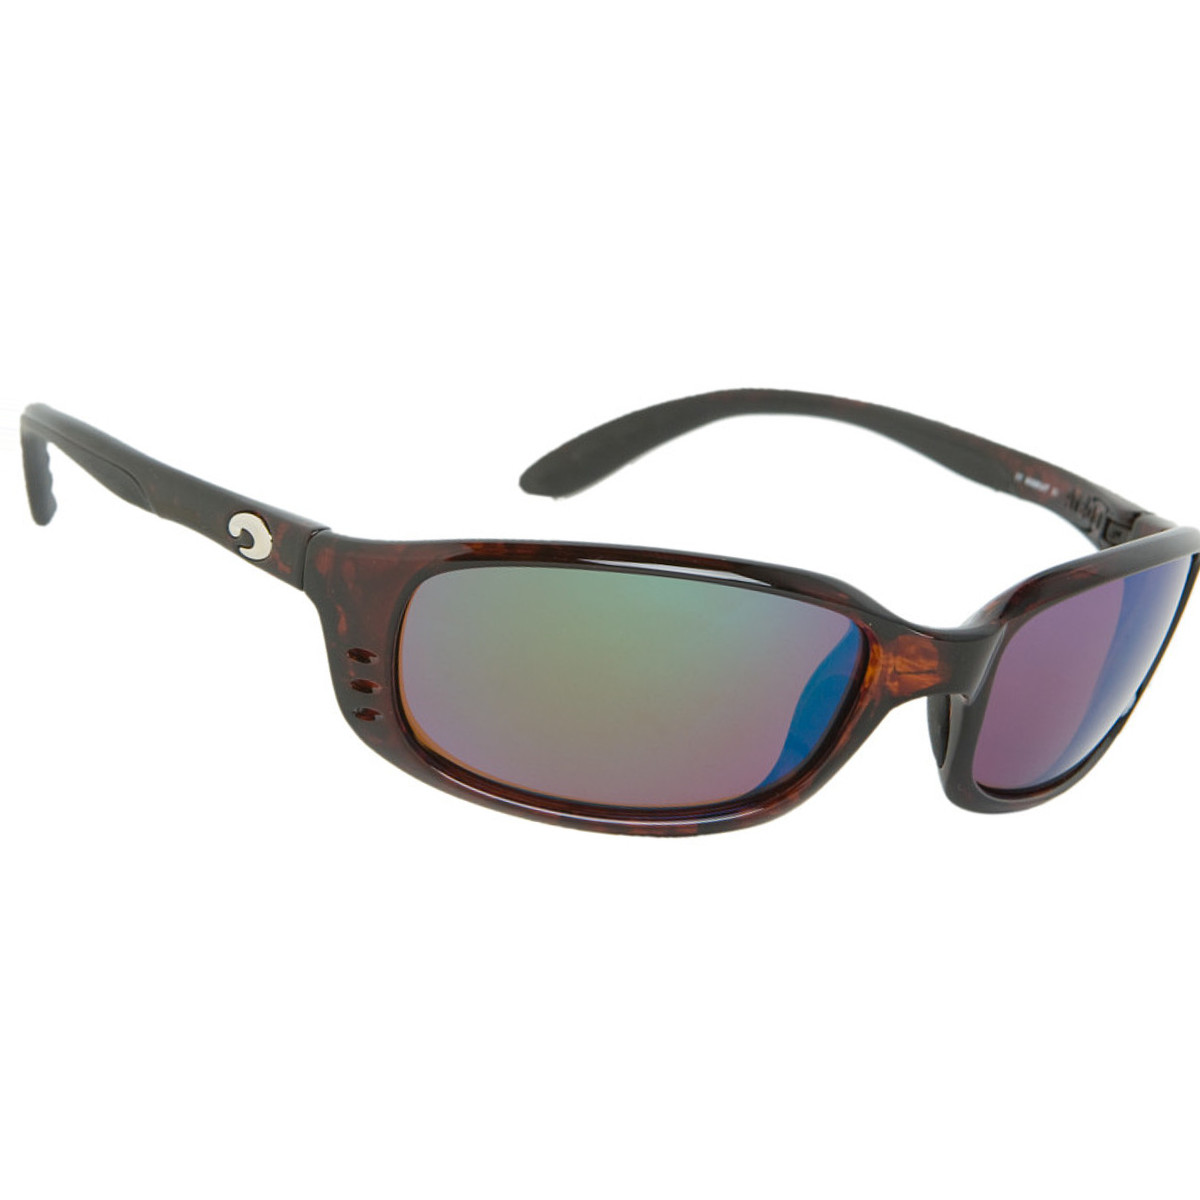 Costa Brine 580G Polarized Sunglasses - Women's